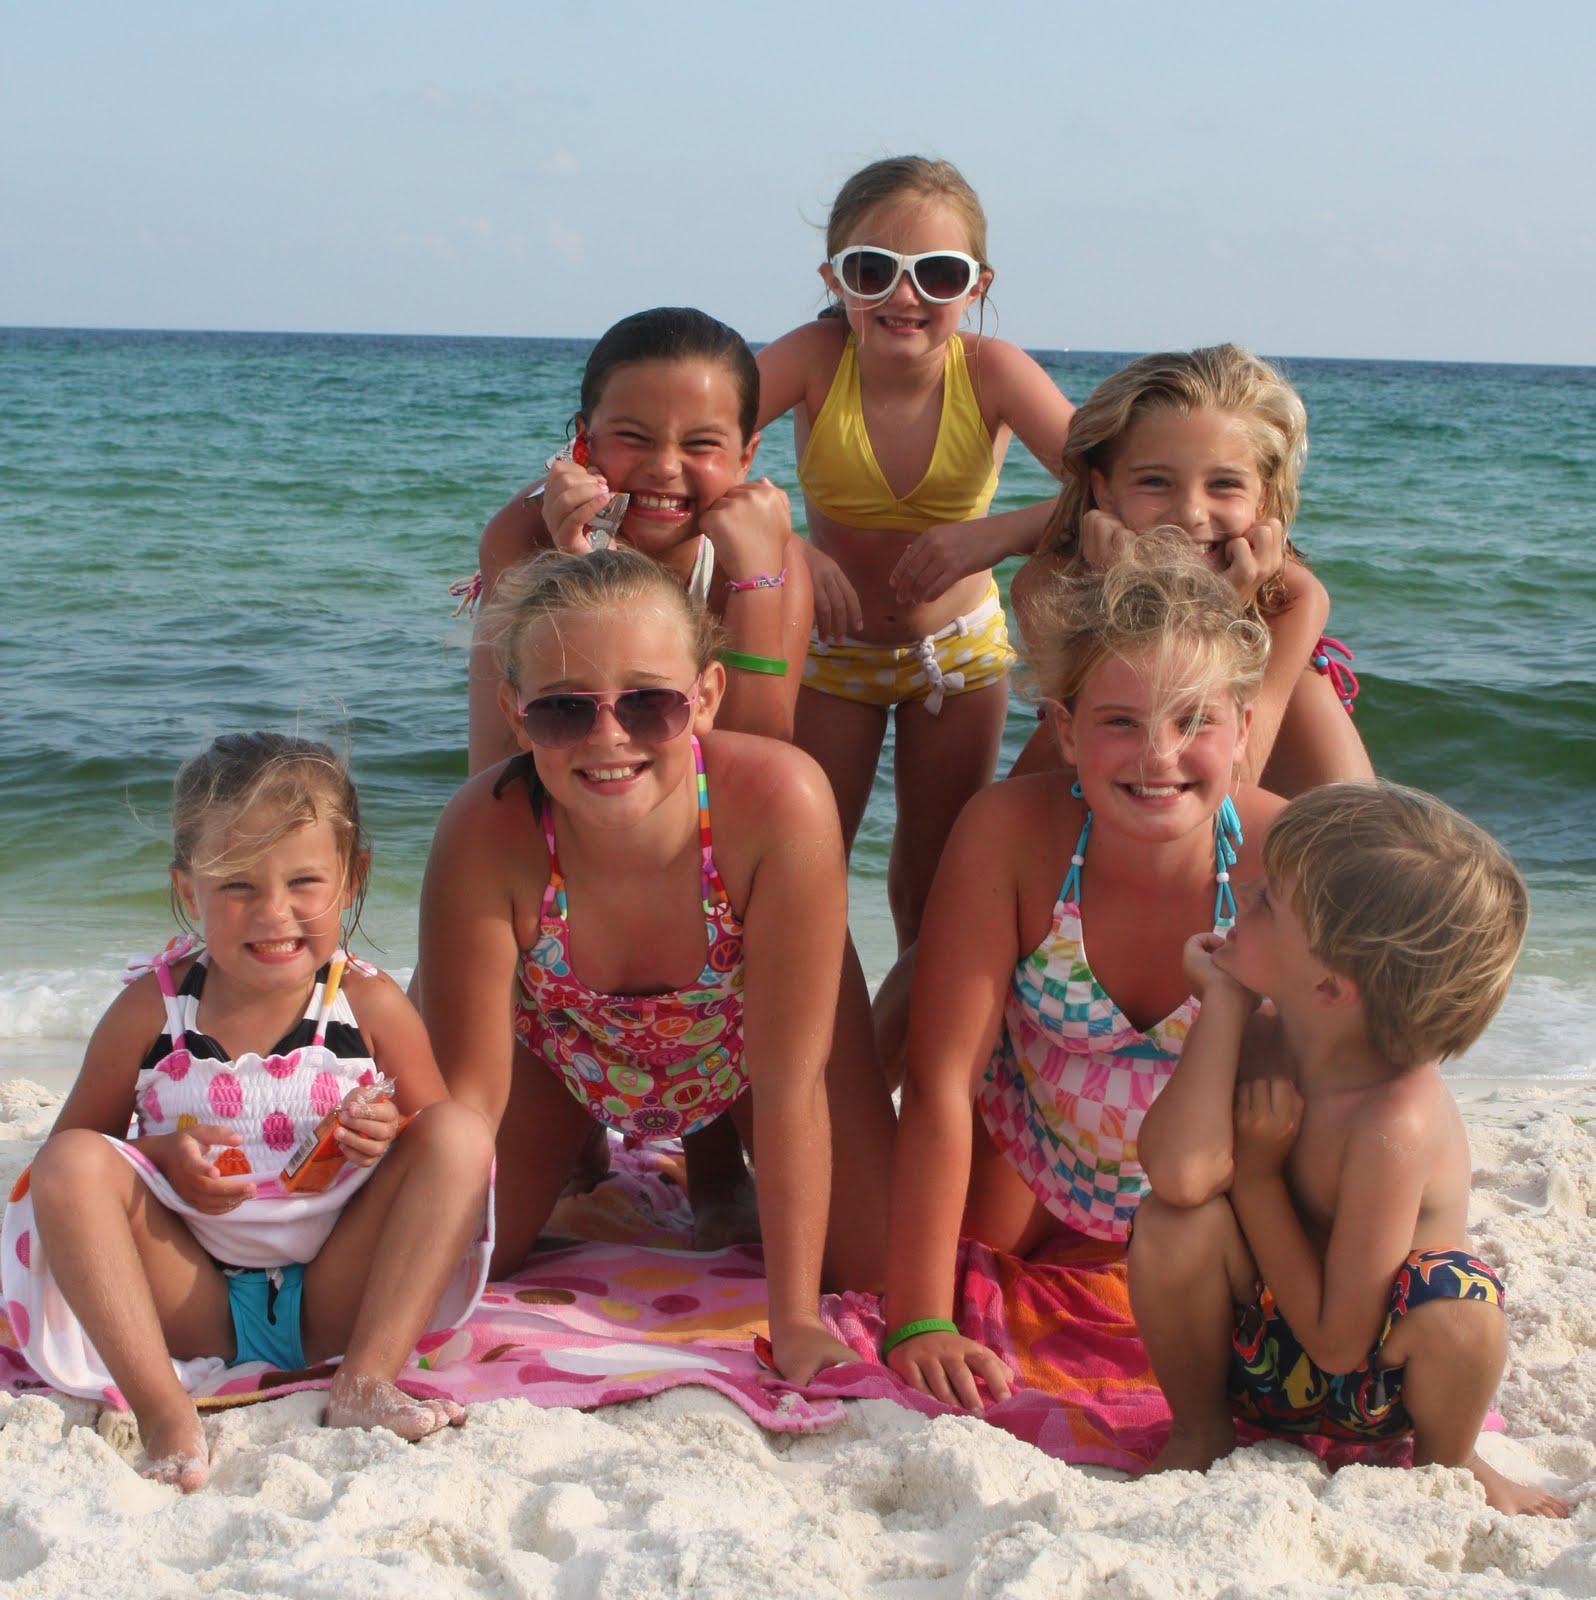 Nudist family girls